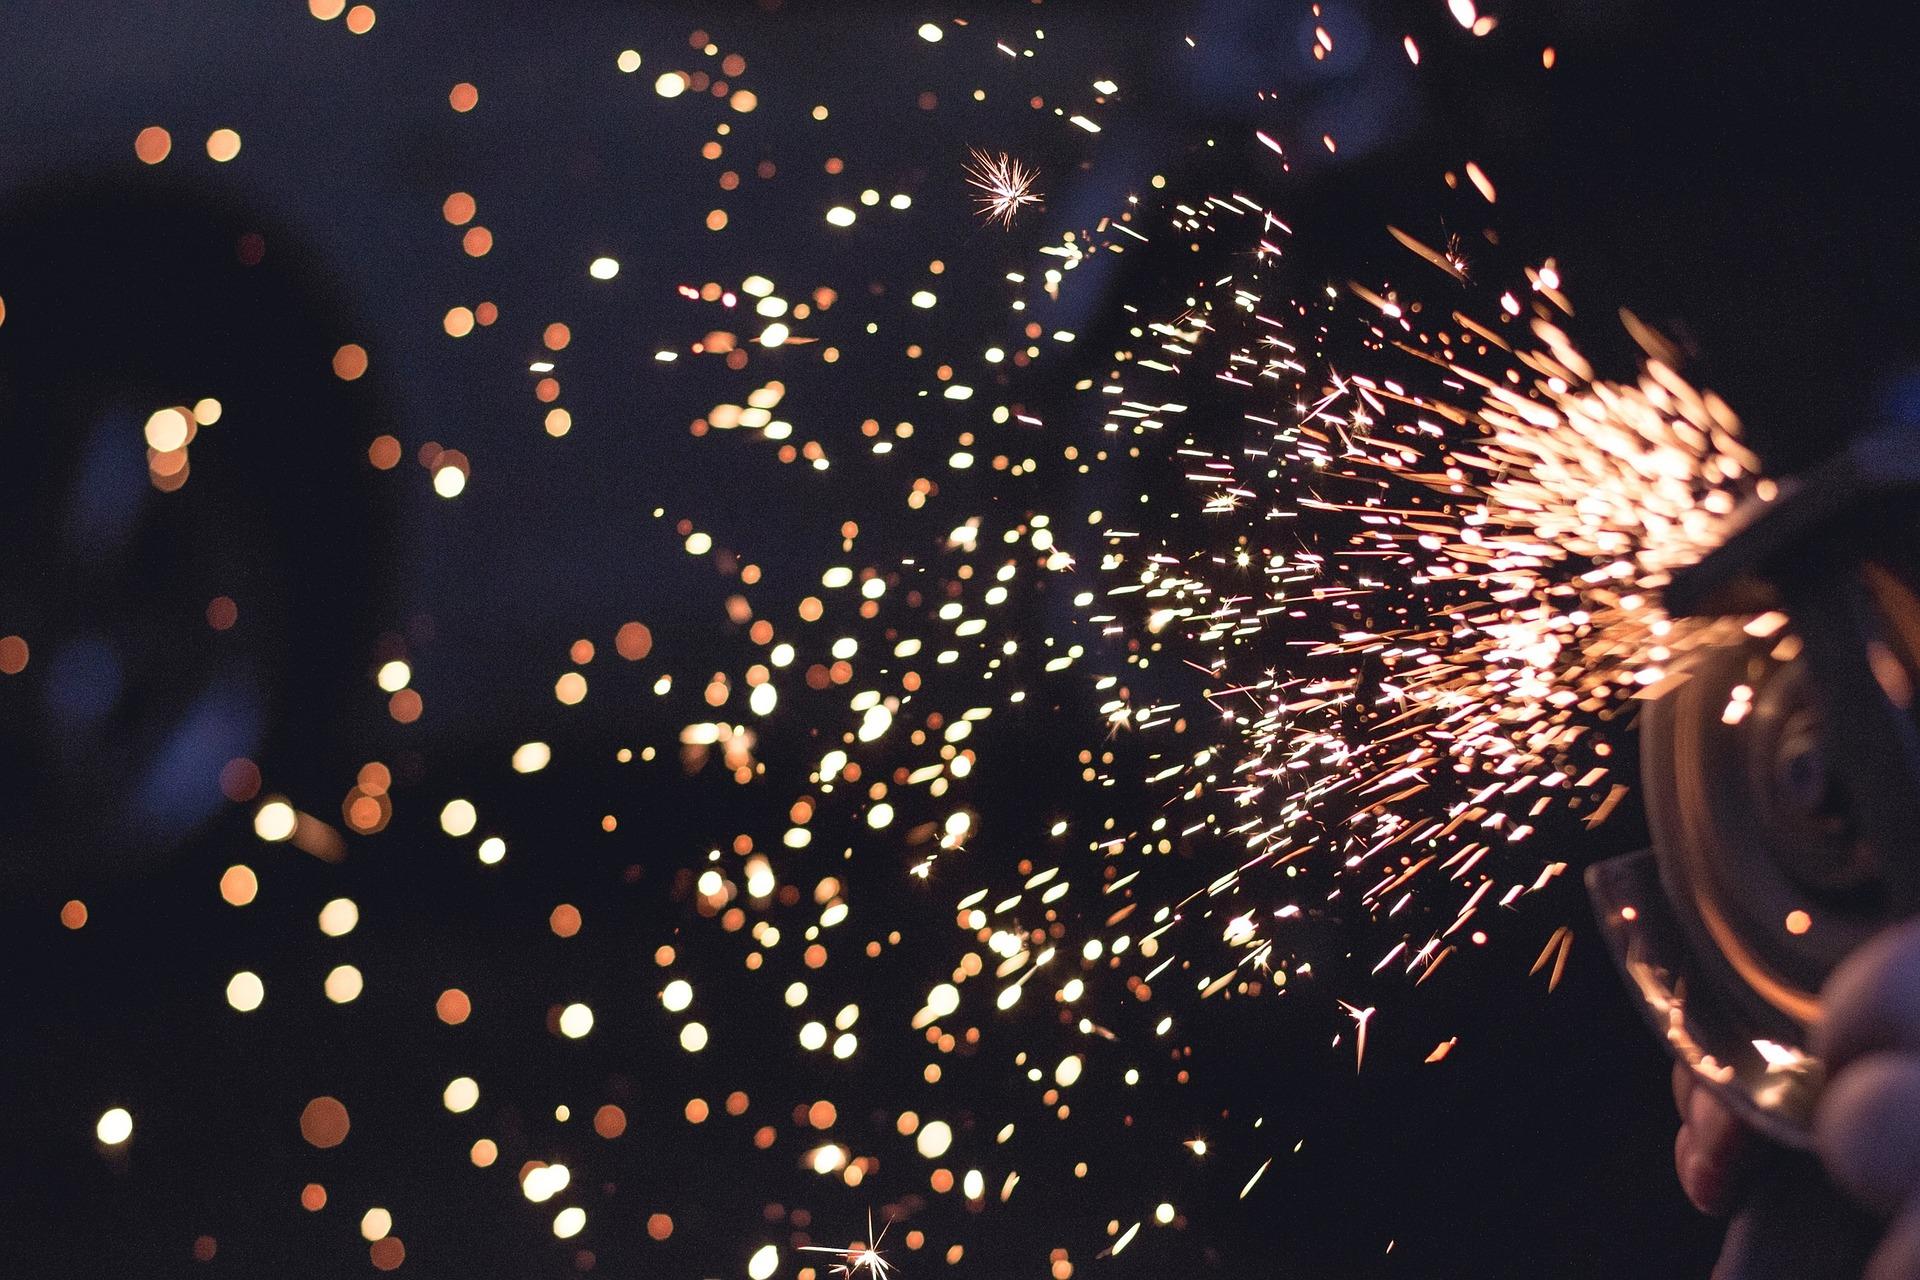 sparks from welder manufacturing metal